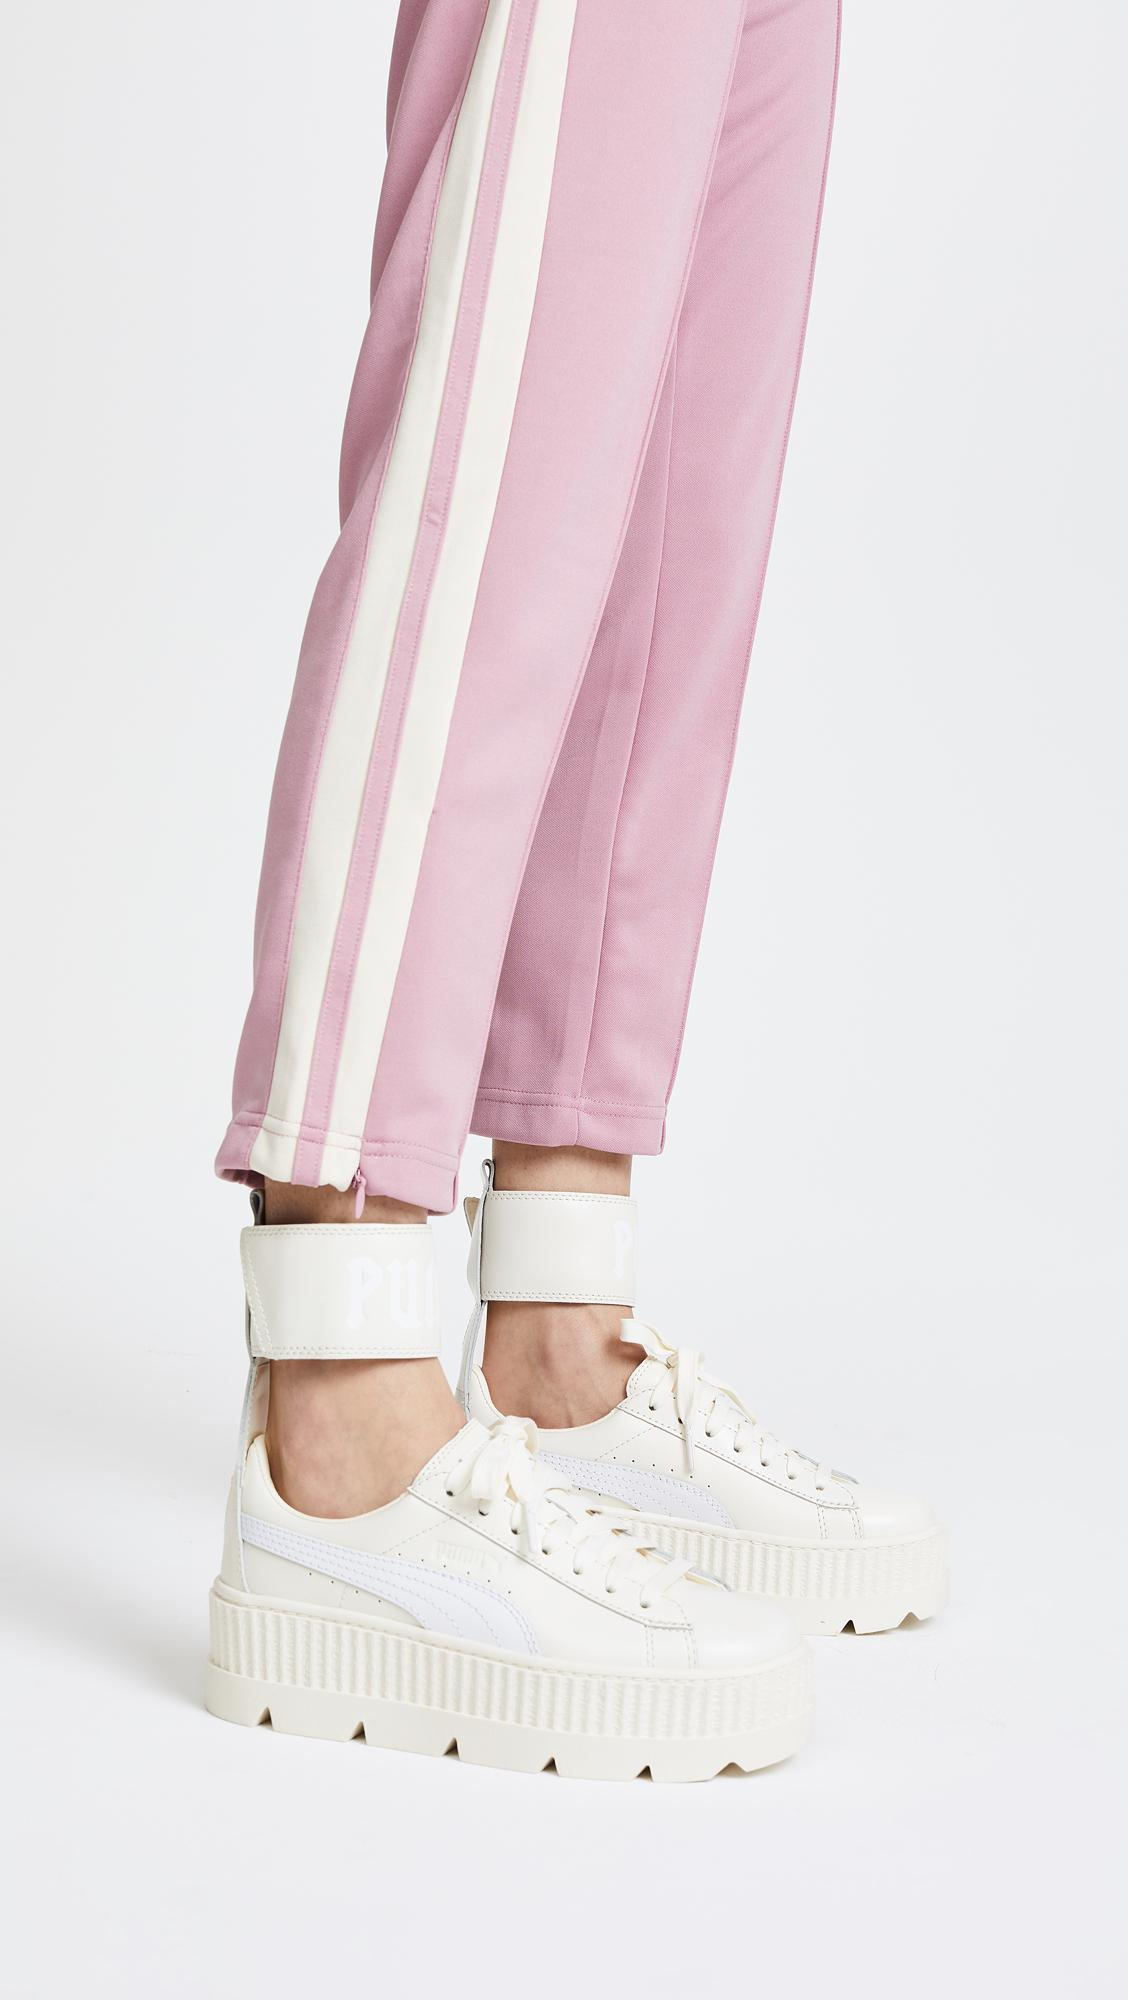 timeless design da986 f0ff3 Women's White Fenty X Ankle Strap Sneakers